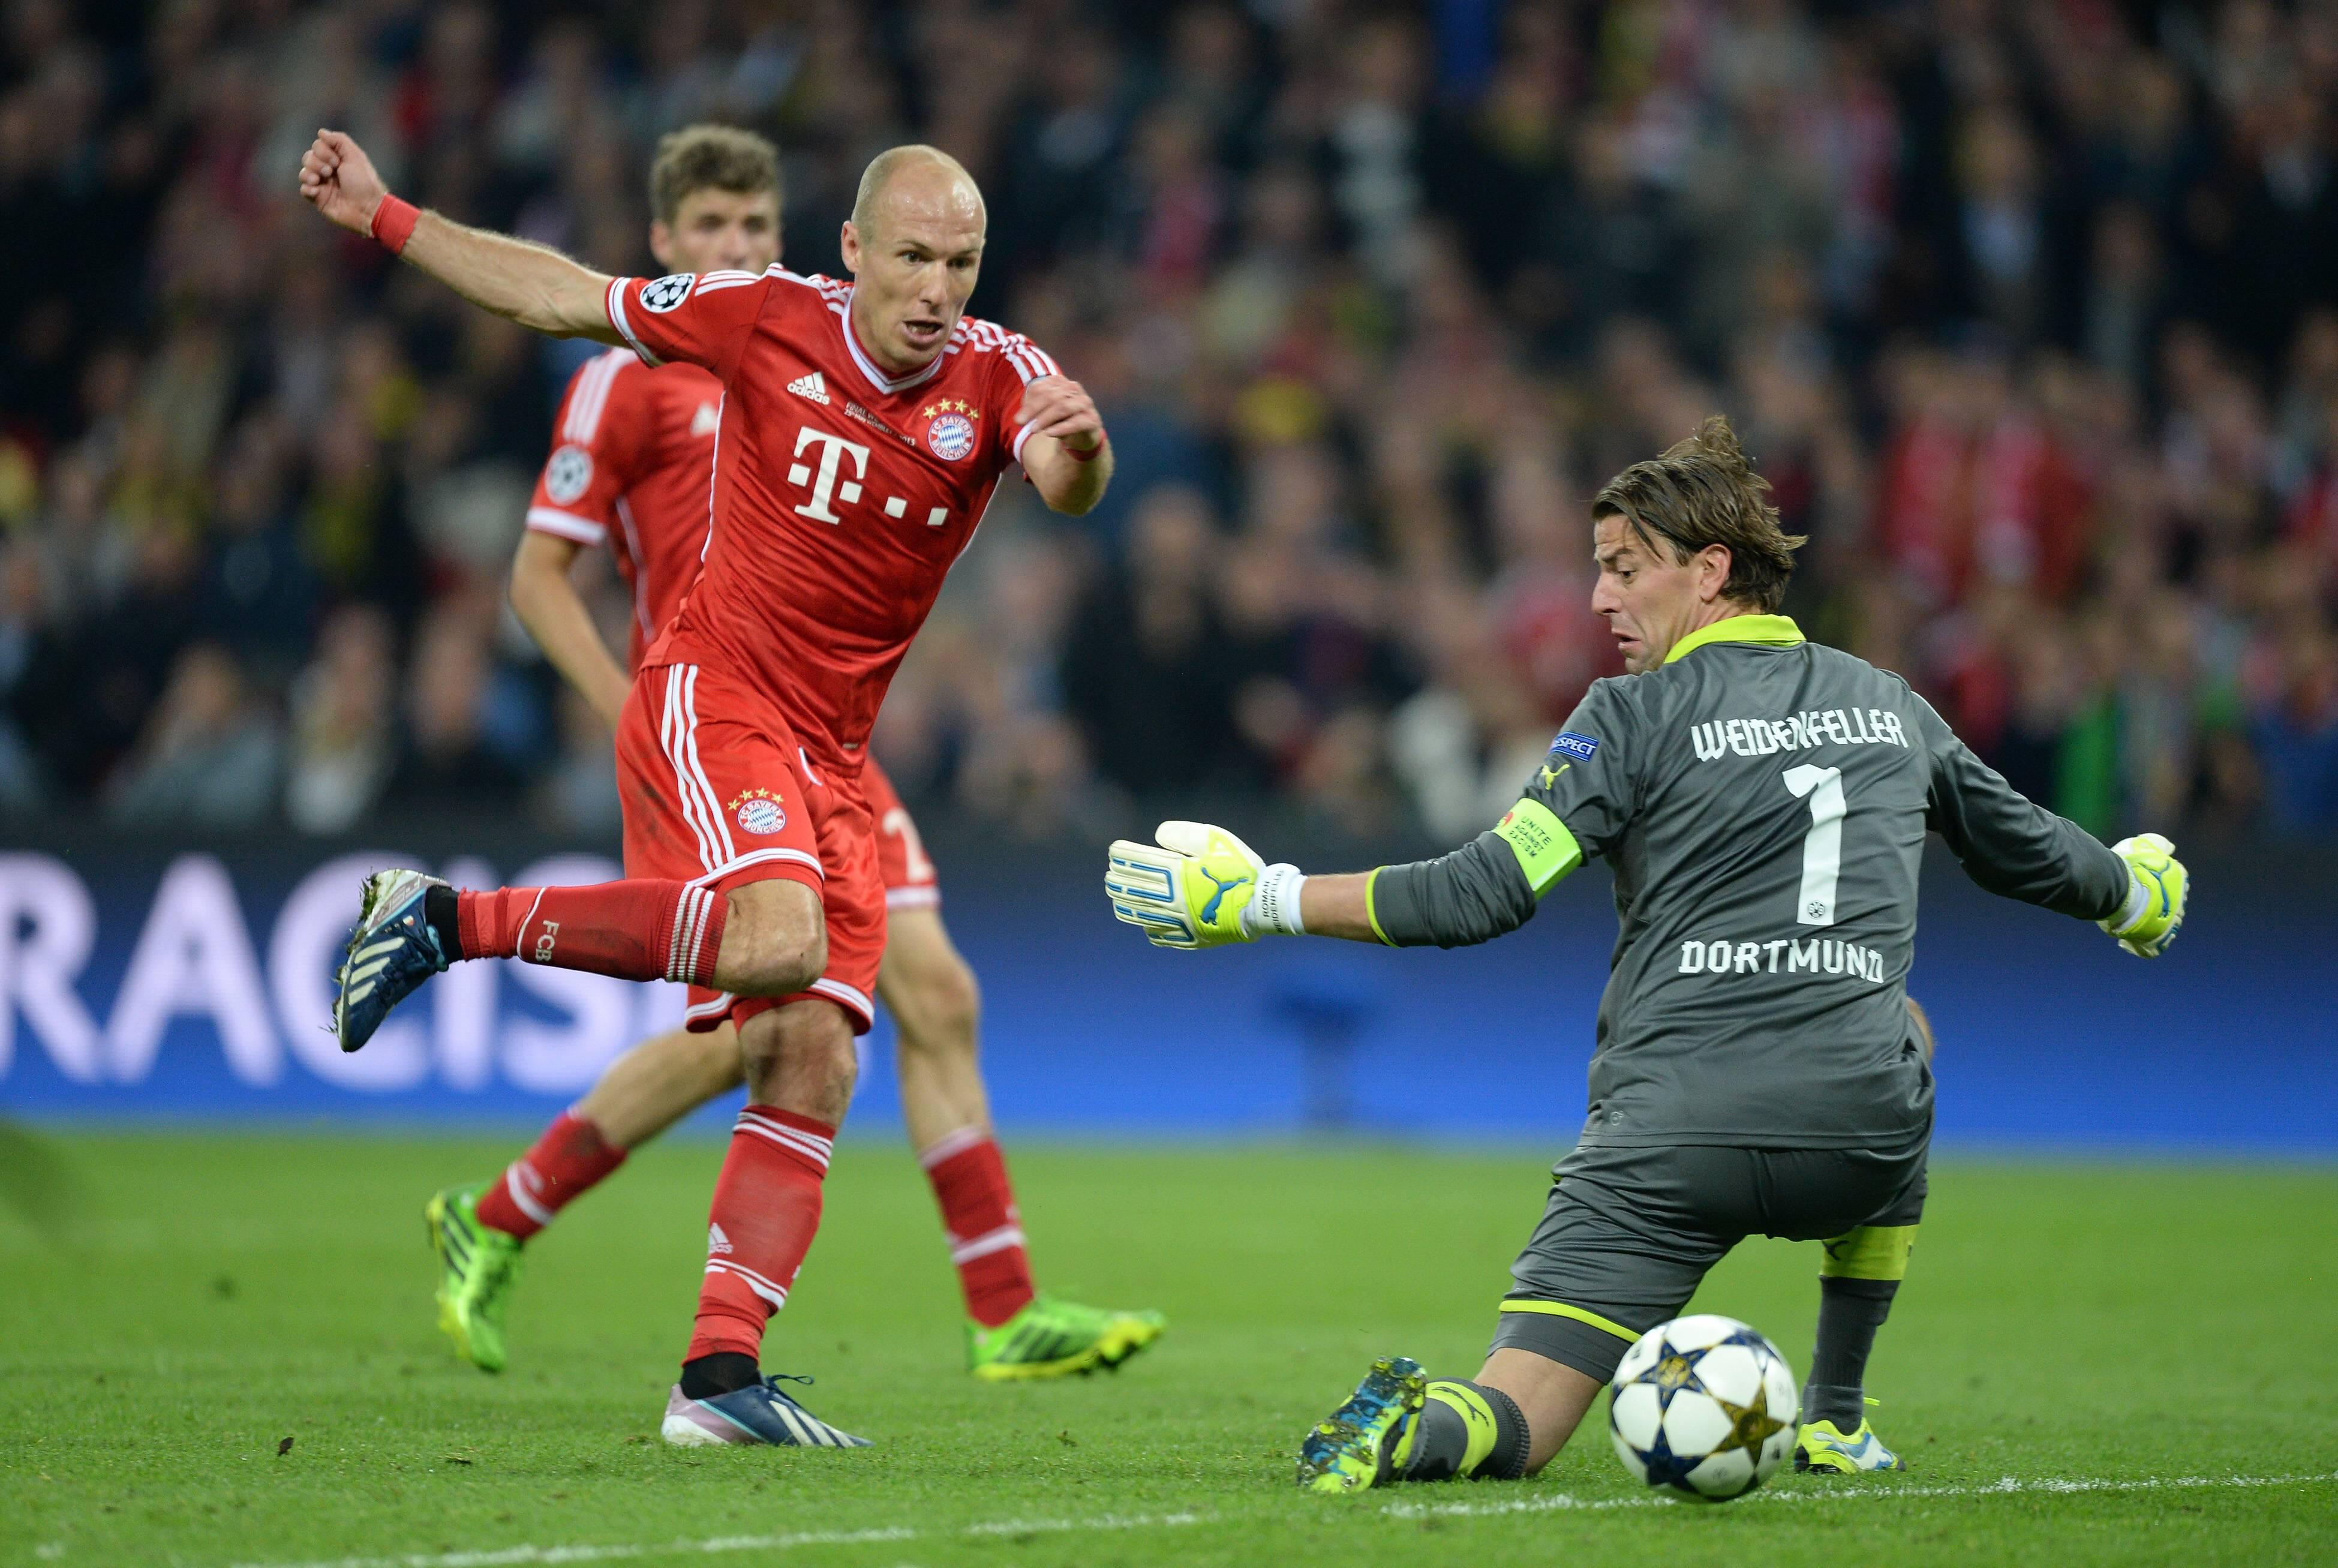 Football - Etranger - Les 10 plus beaux buts du Bayern Munich face à Dortmund